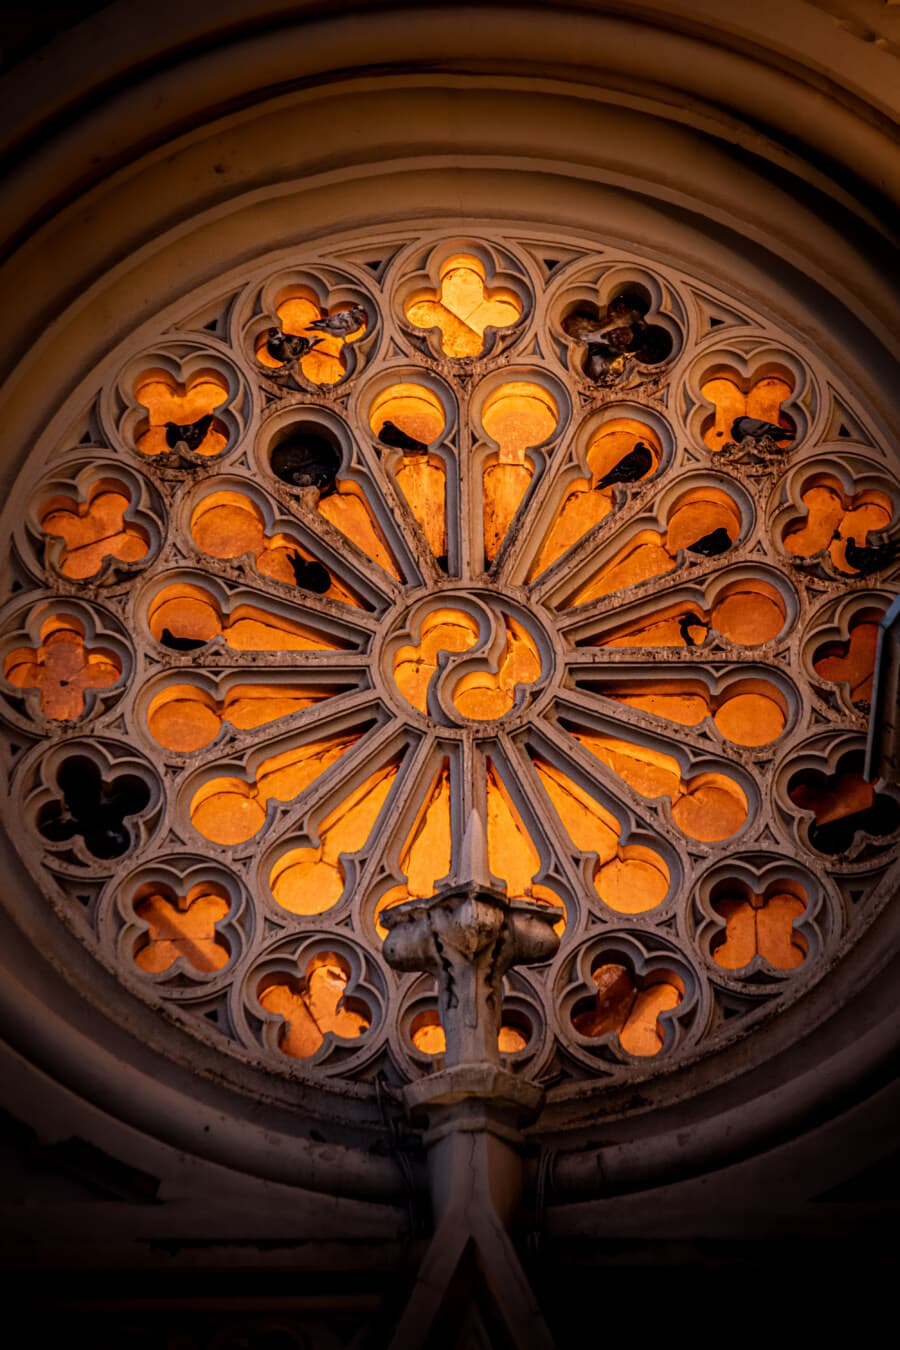 baroque, window, round, architectural style, church, unique, fine arts, decorative, abstract, framework